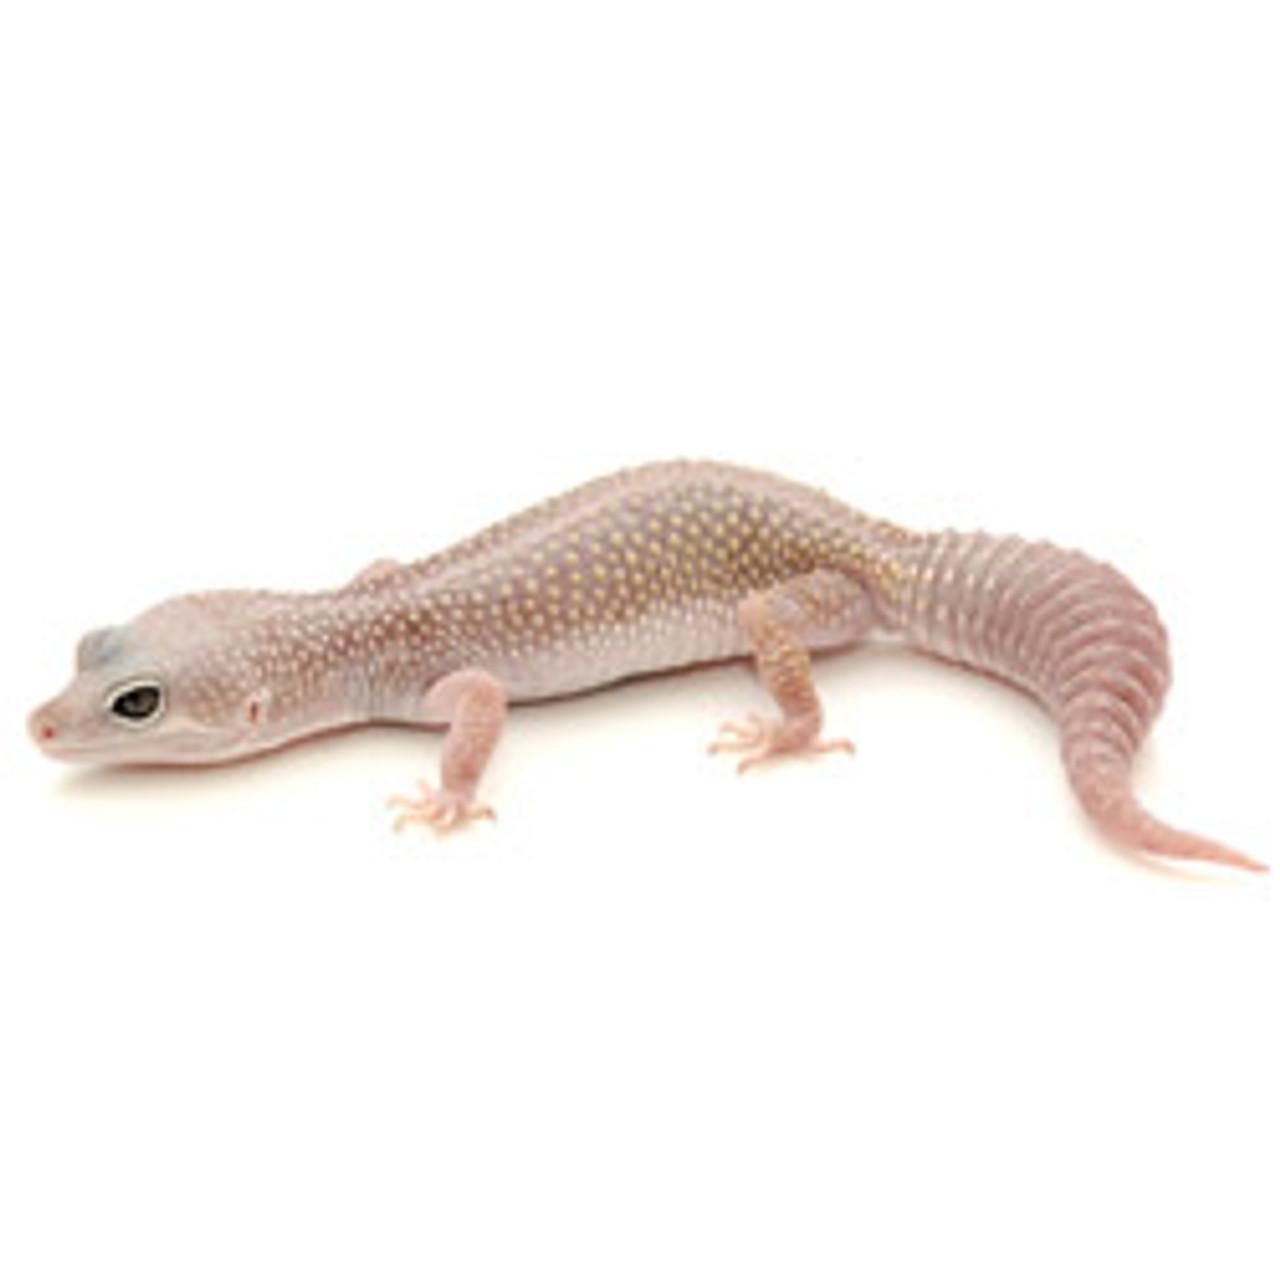 Blizzard Leopard Gecko (Eublepharis macularius) Adult